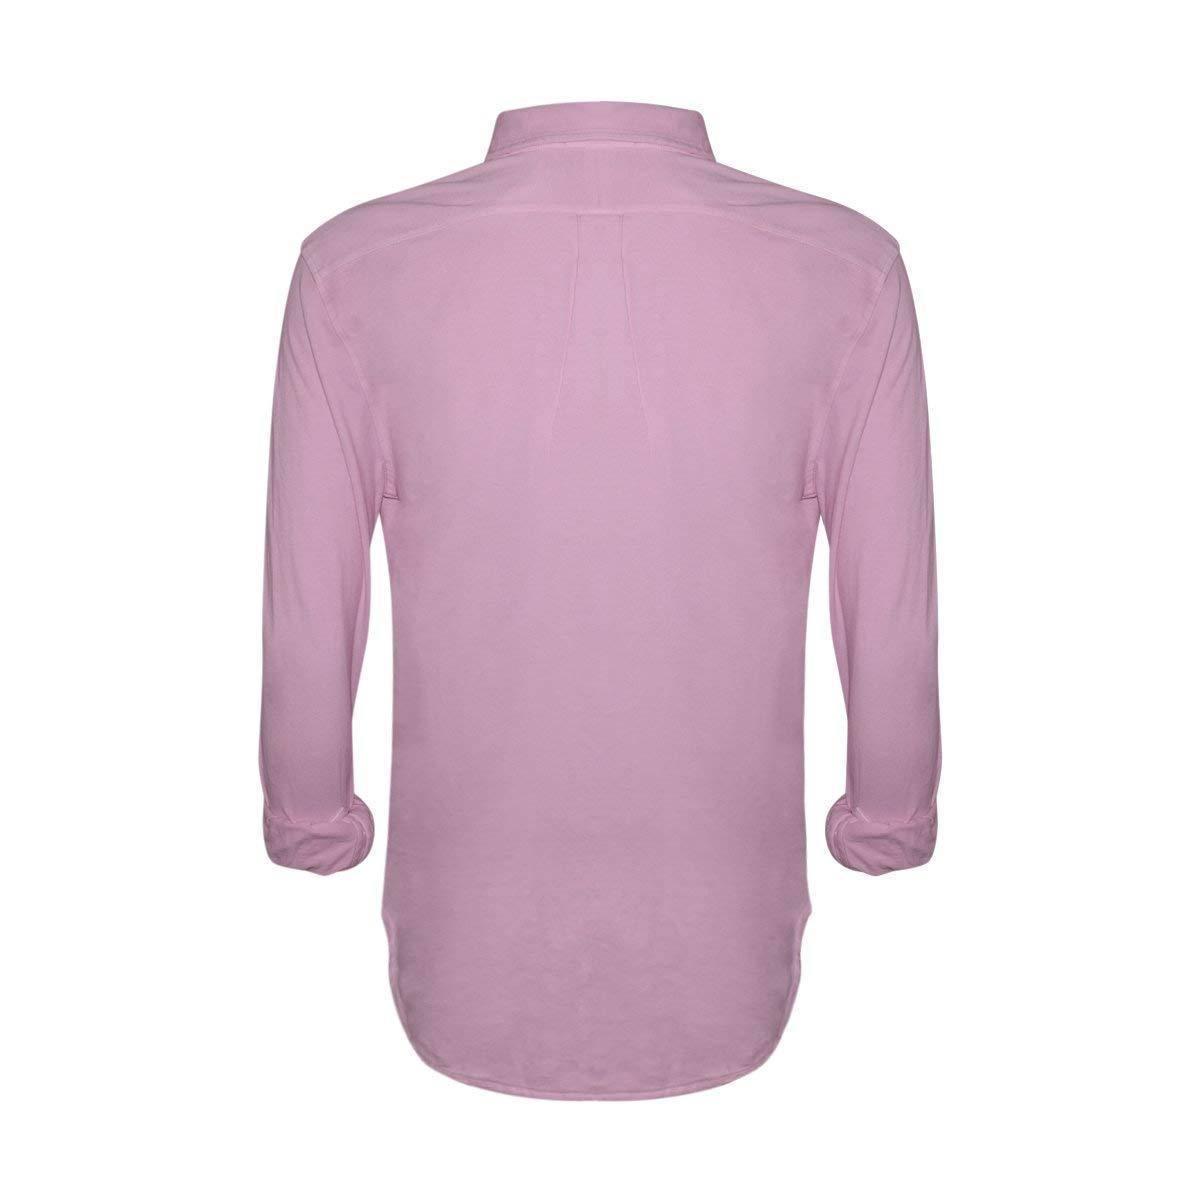 Ralph Lauren Mesh L Normal S Xl Neuer Polo M Federgewicht Pink O5Znaqx